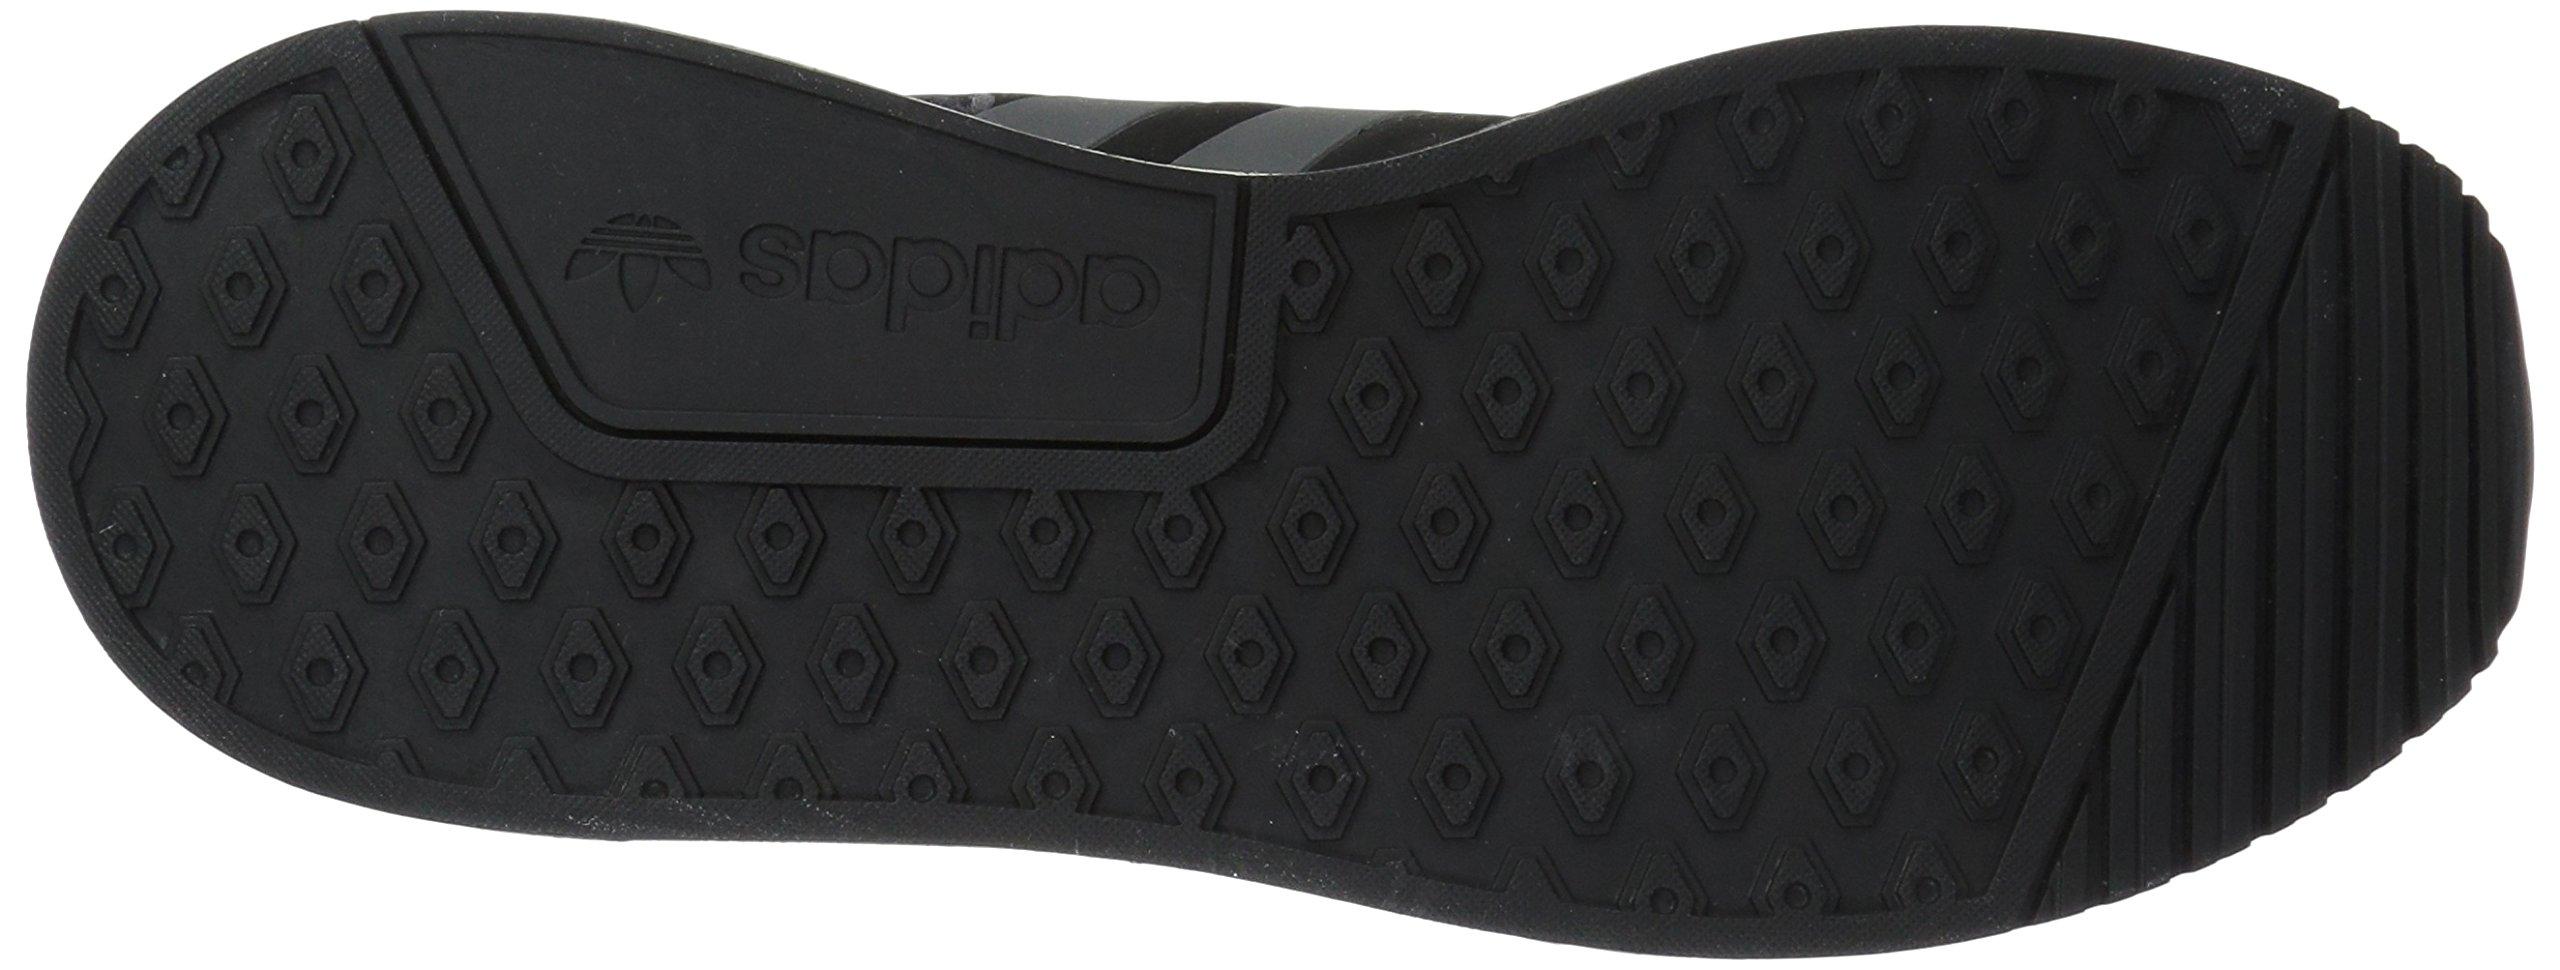 adidas Originals Mens X_PLR Running Shoe Sneaker Grey/Black, 4.5 M US by adidas Originals (Image #3)